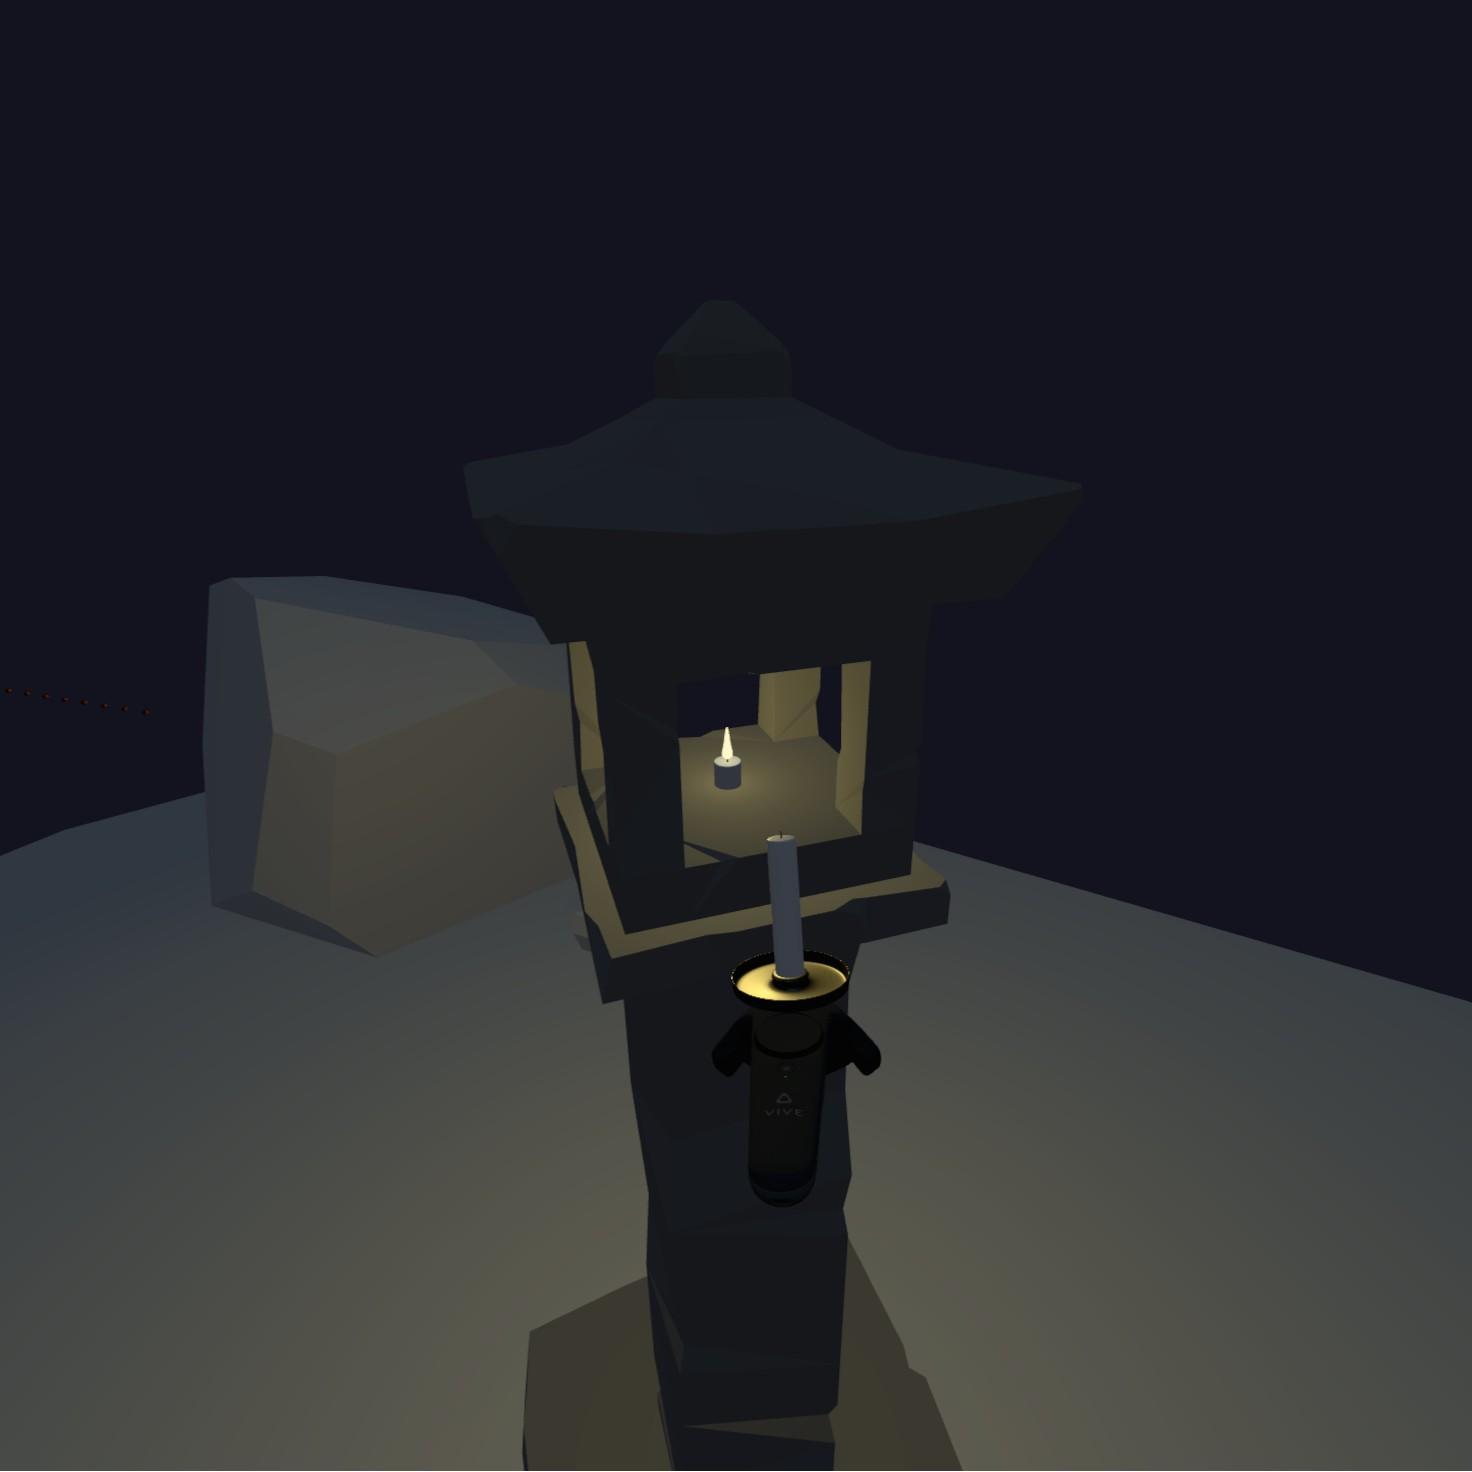 An unlit candle, approaching a lit lantern flame.